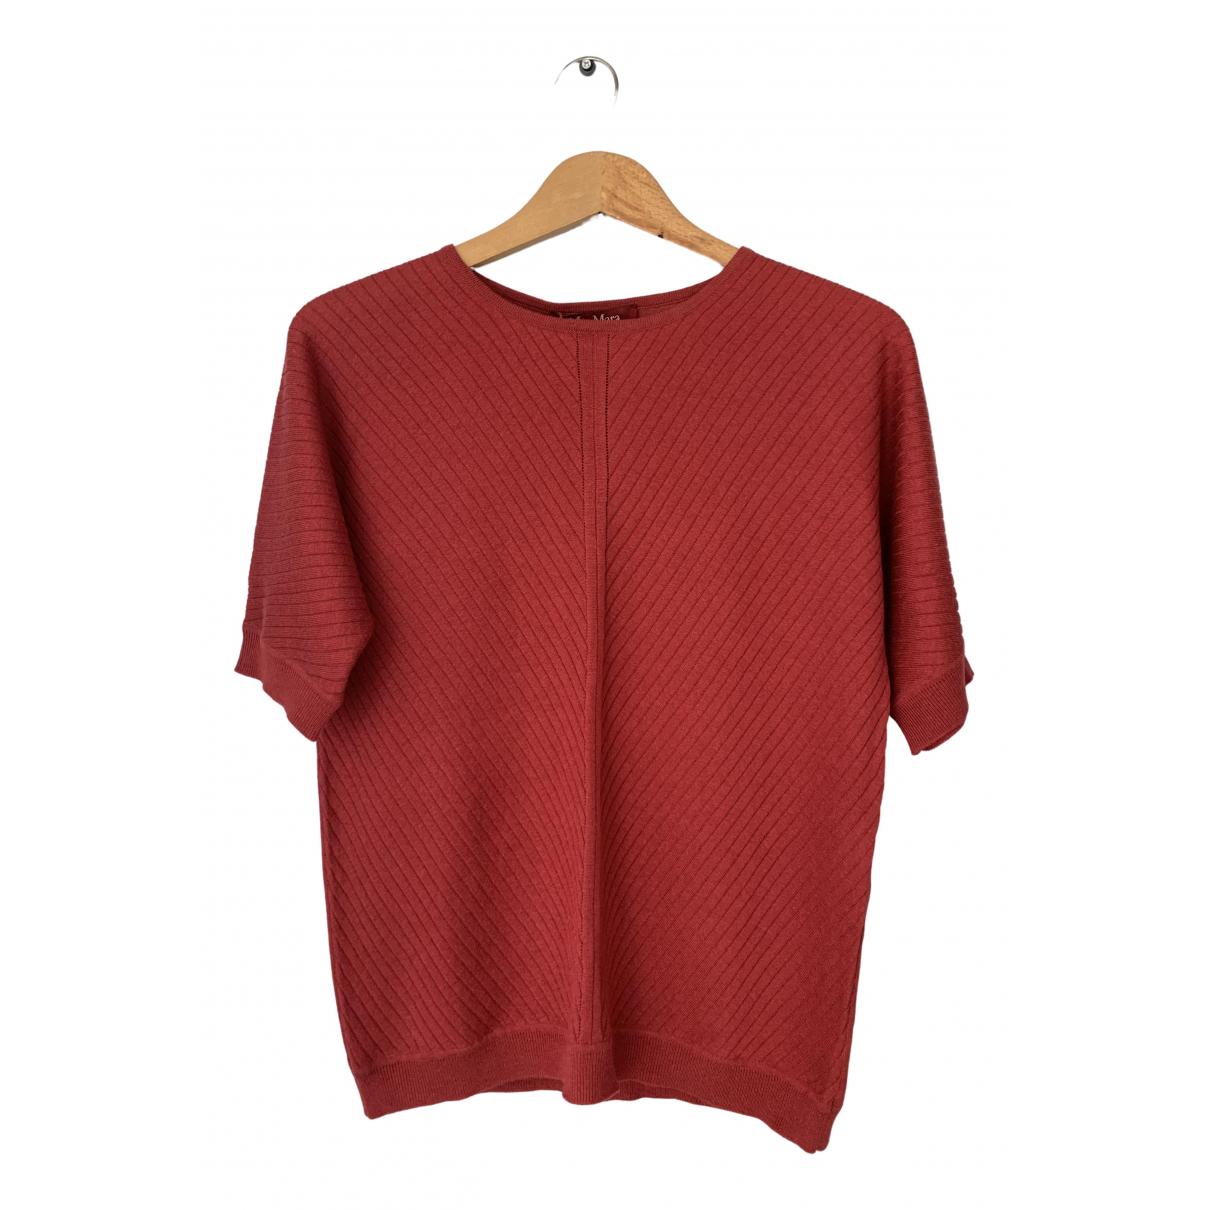 Max Mara Studio N Red Wool  top for Women S International